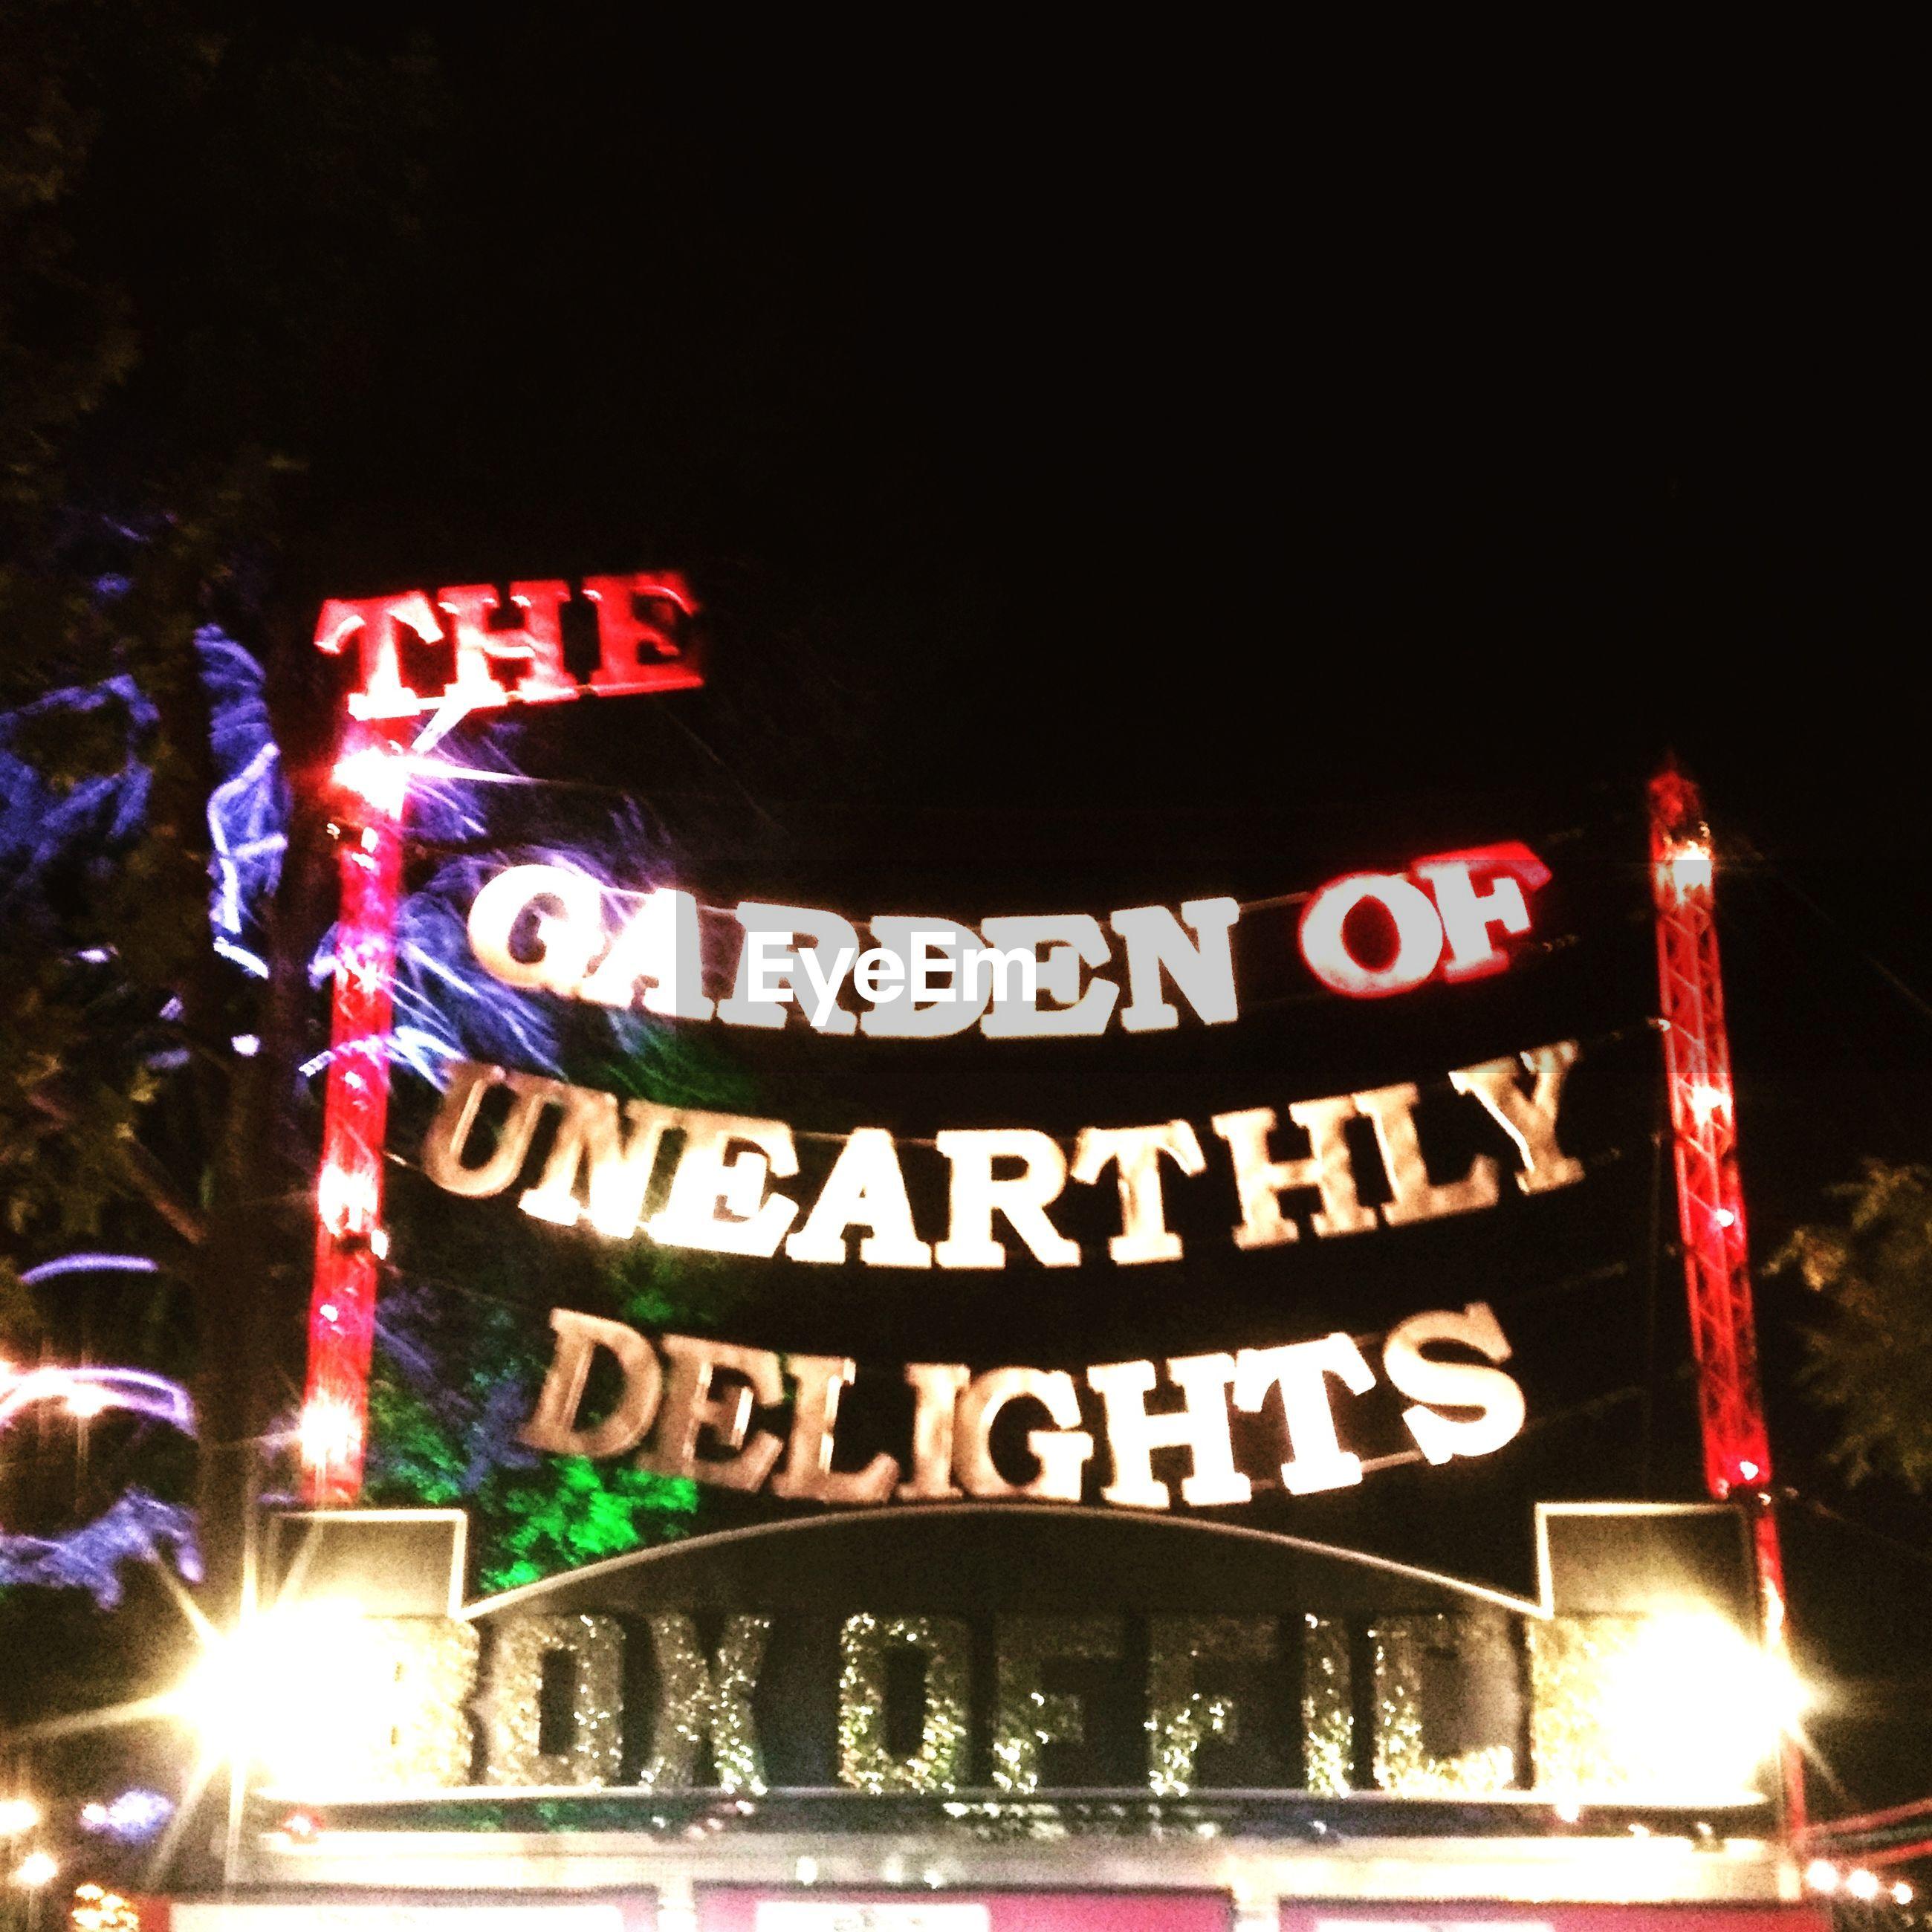 illuminated, night, text, neon, communication, no people, outdoors, city, nightlife